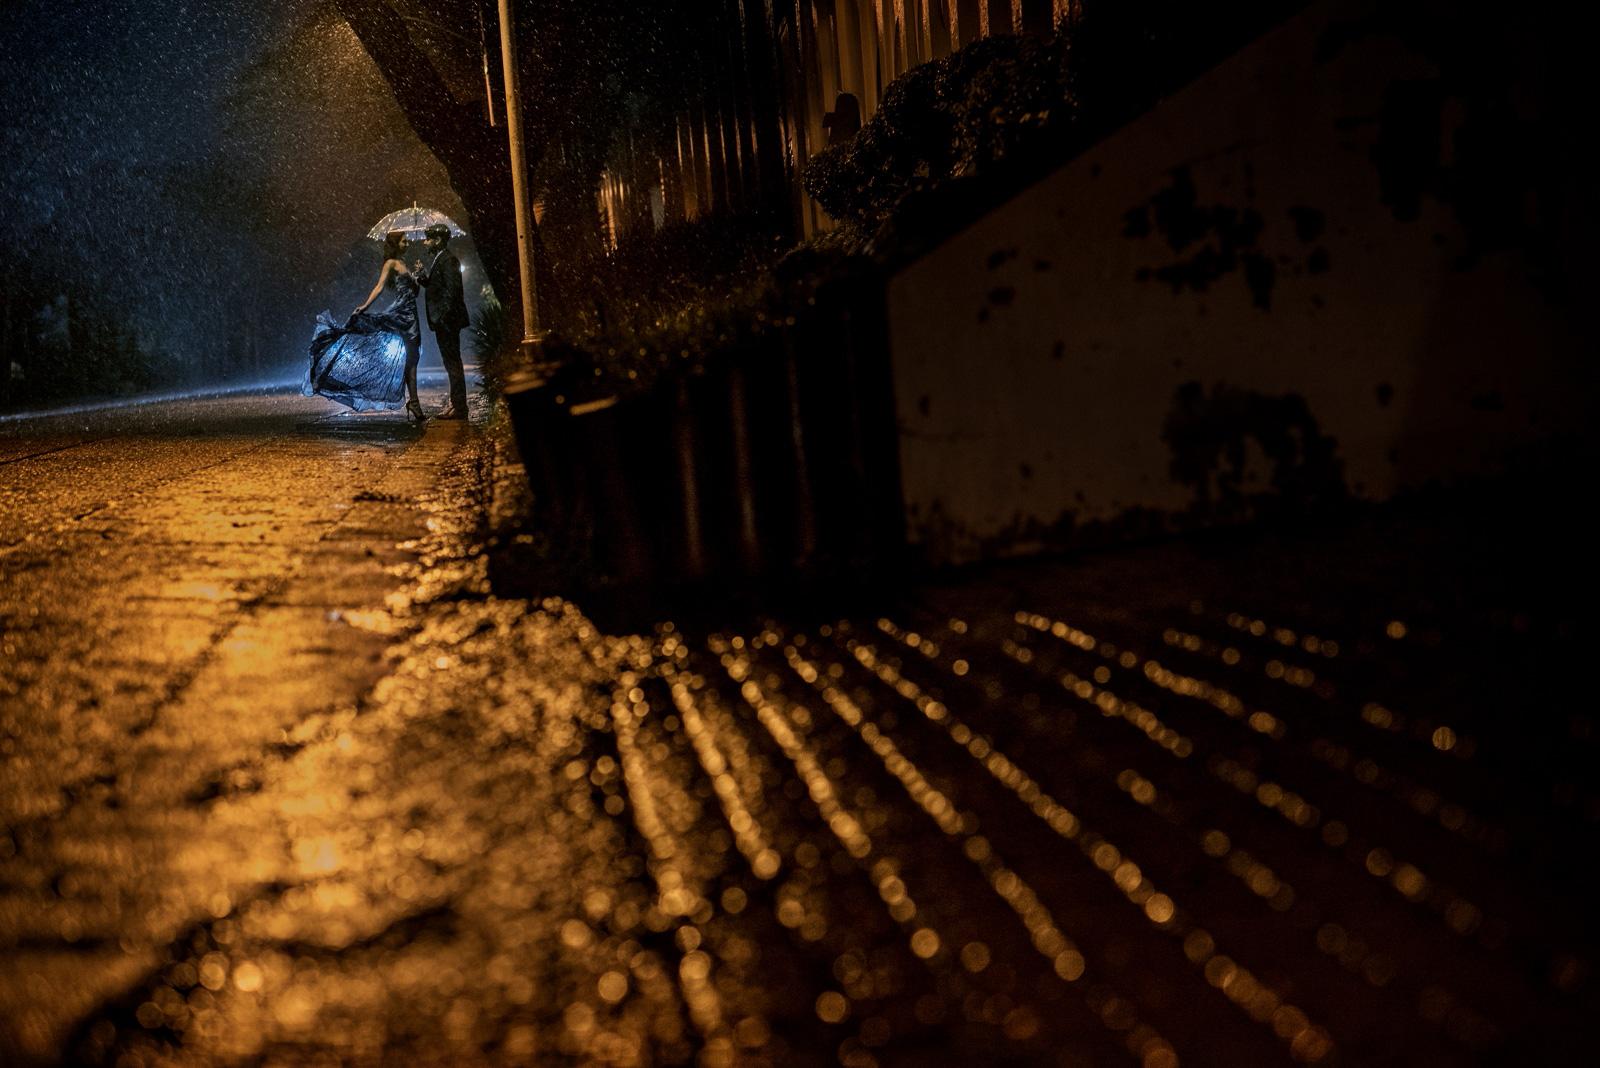 Rainy engagement shoot at night